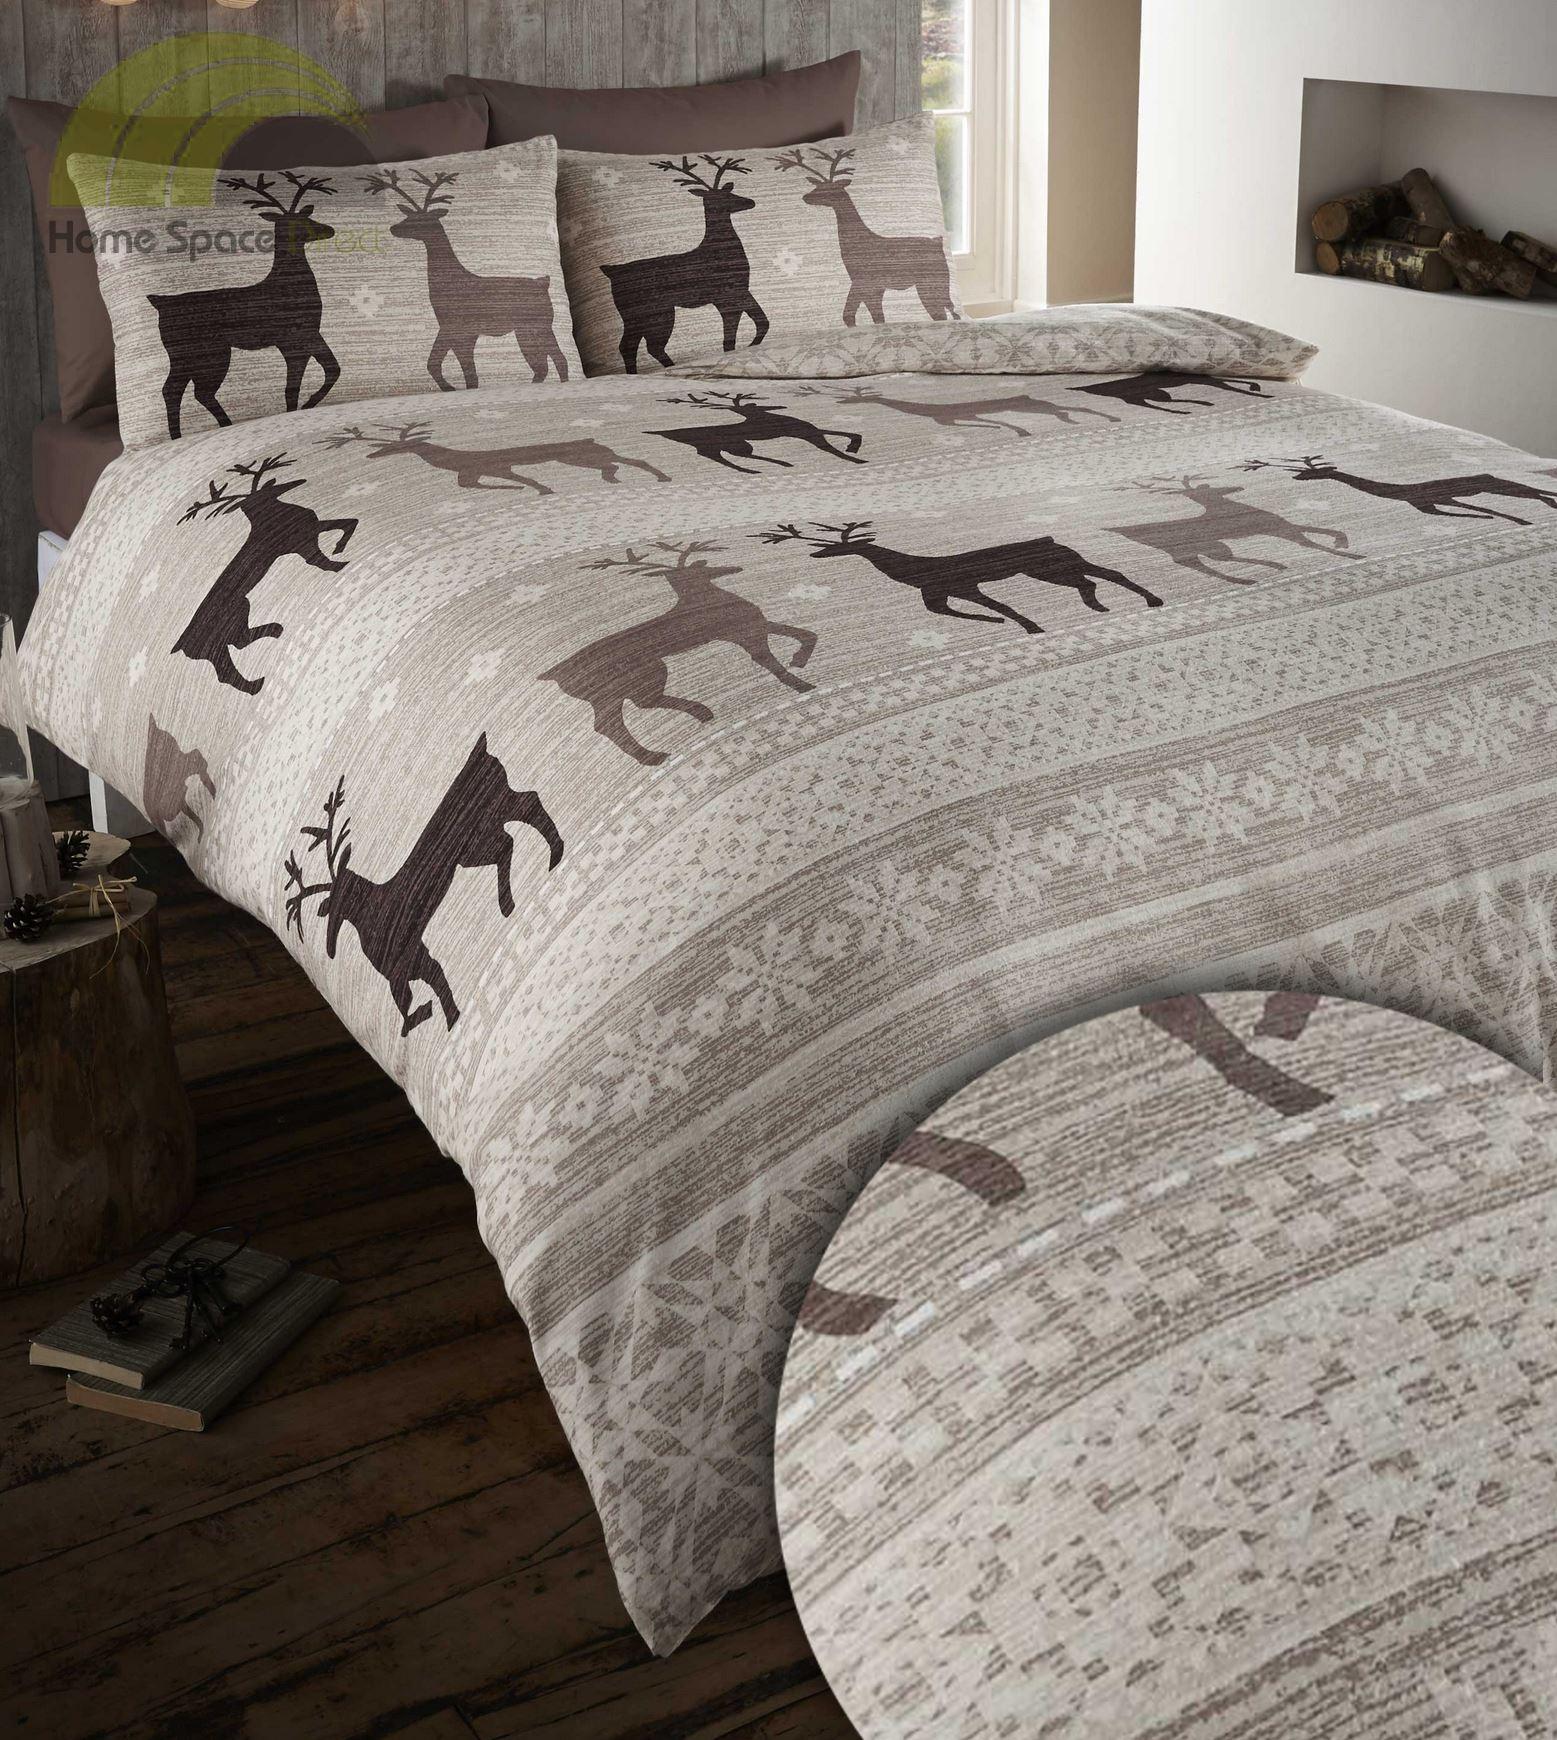 100 Brushed Cotton Flannelette Quilt Duvet Cover Bedding